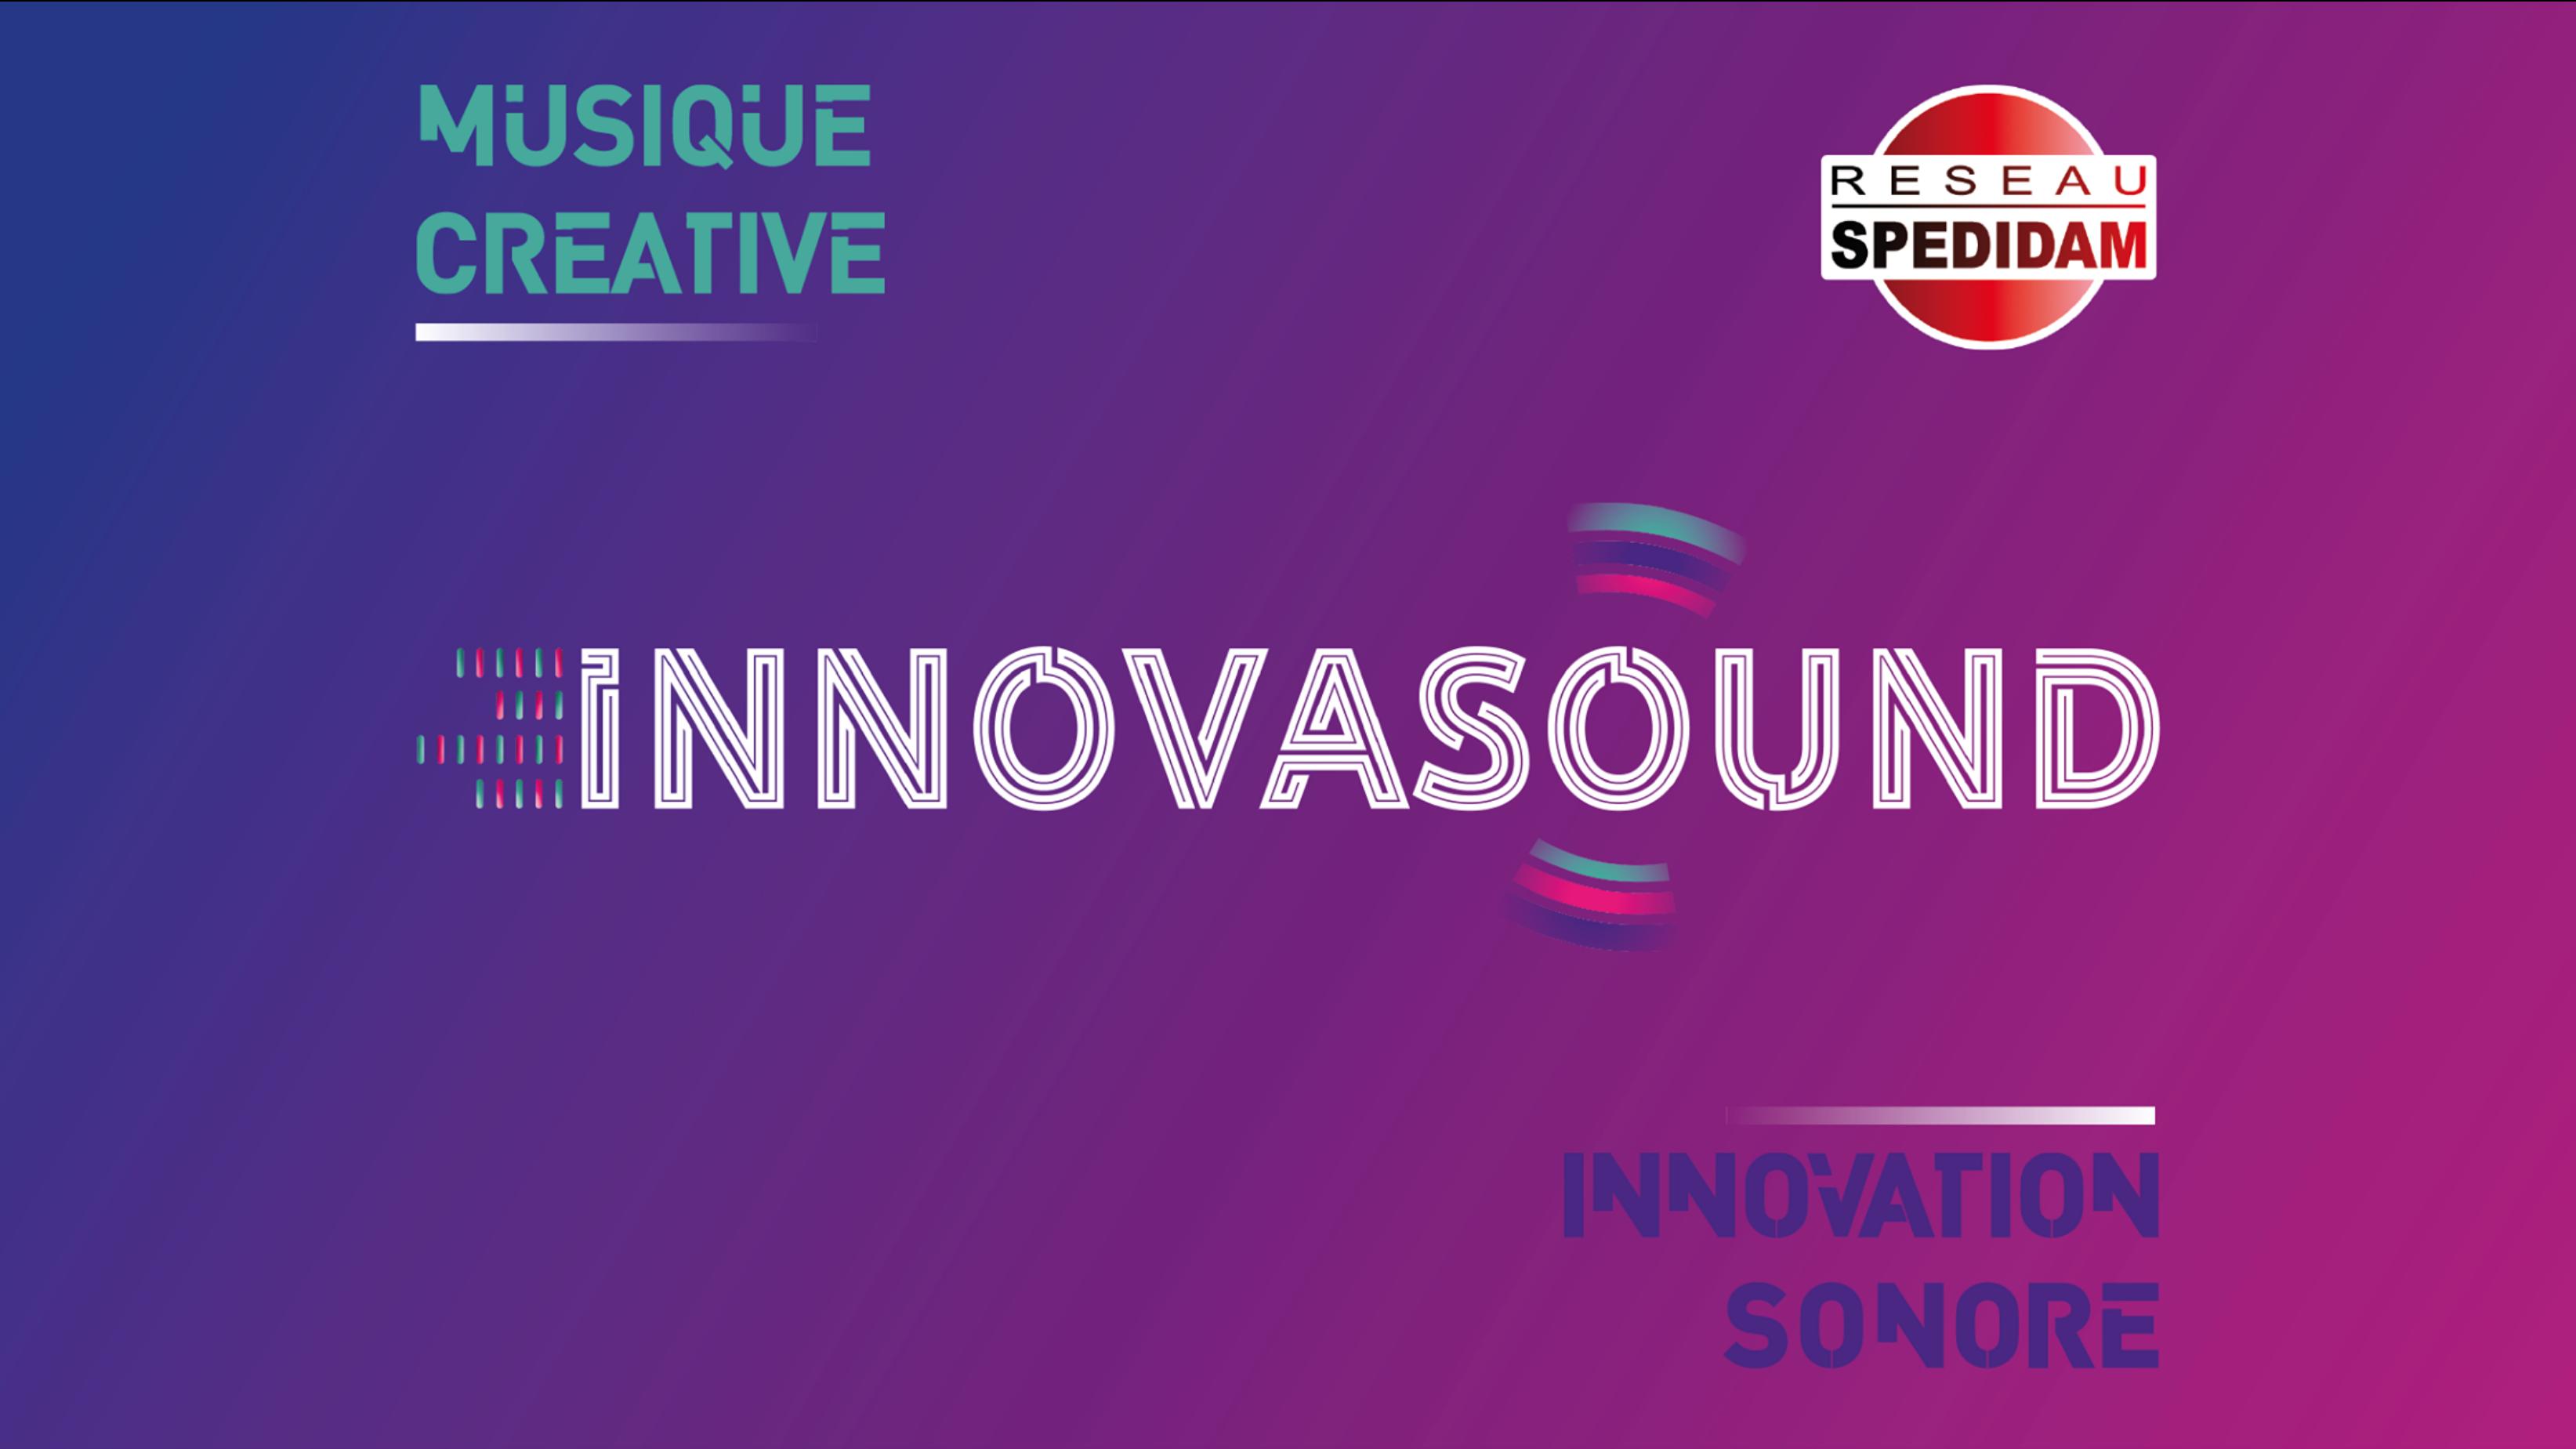 Festival Innovasound